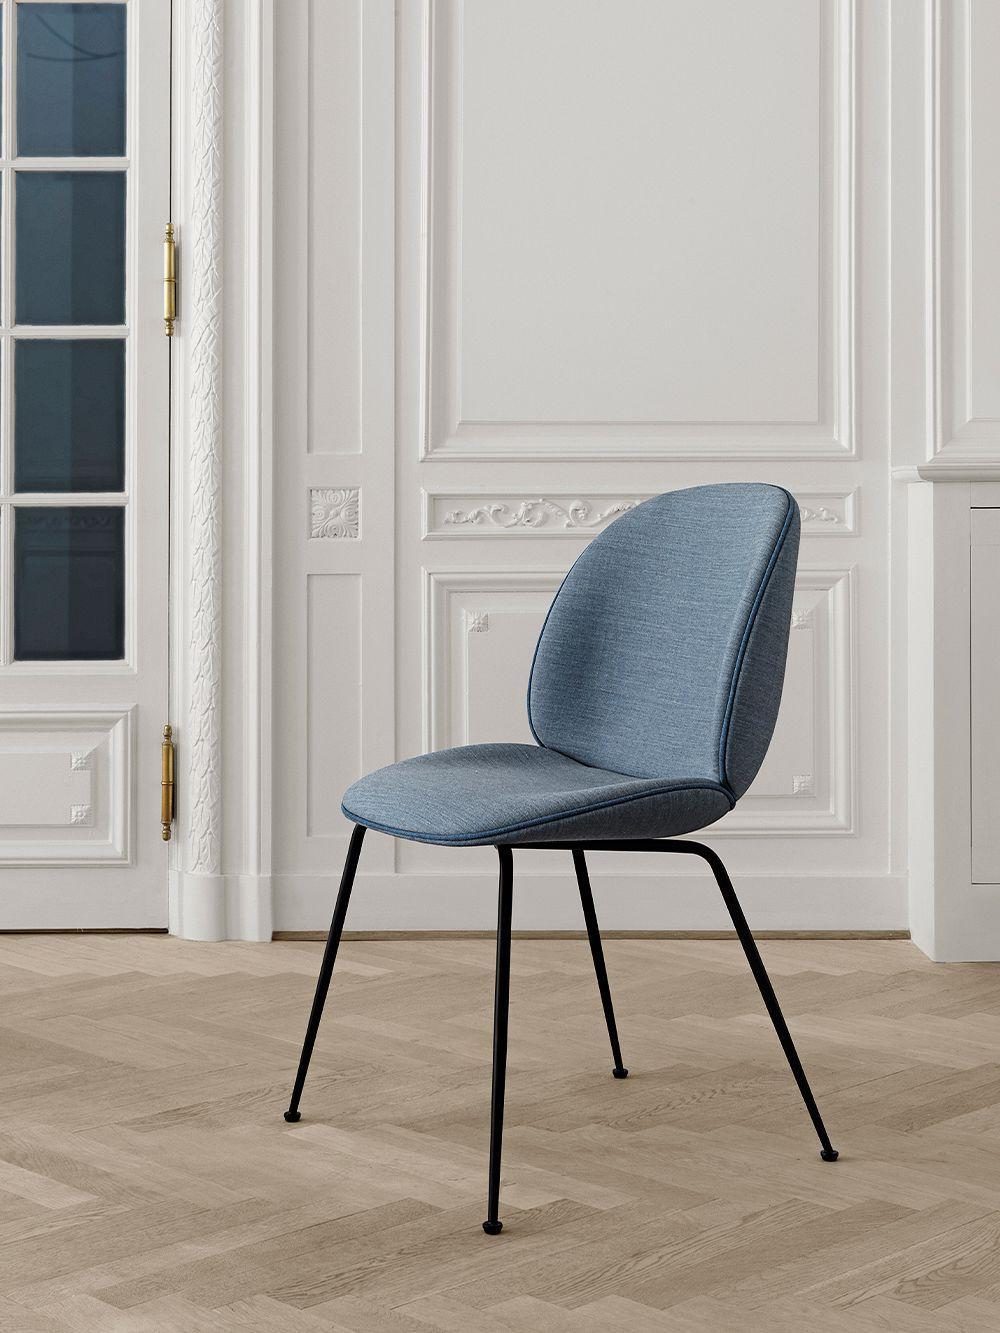 Gubi Beetle chair, black steel - Remix 733